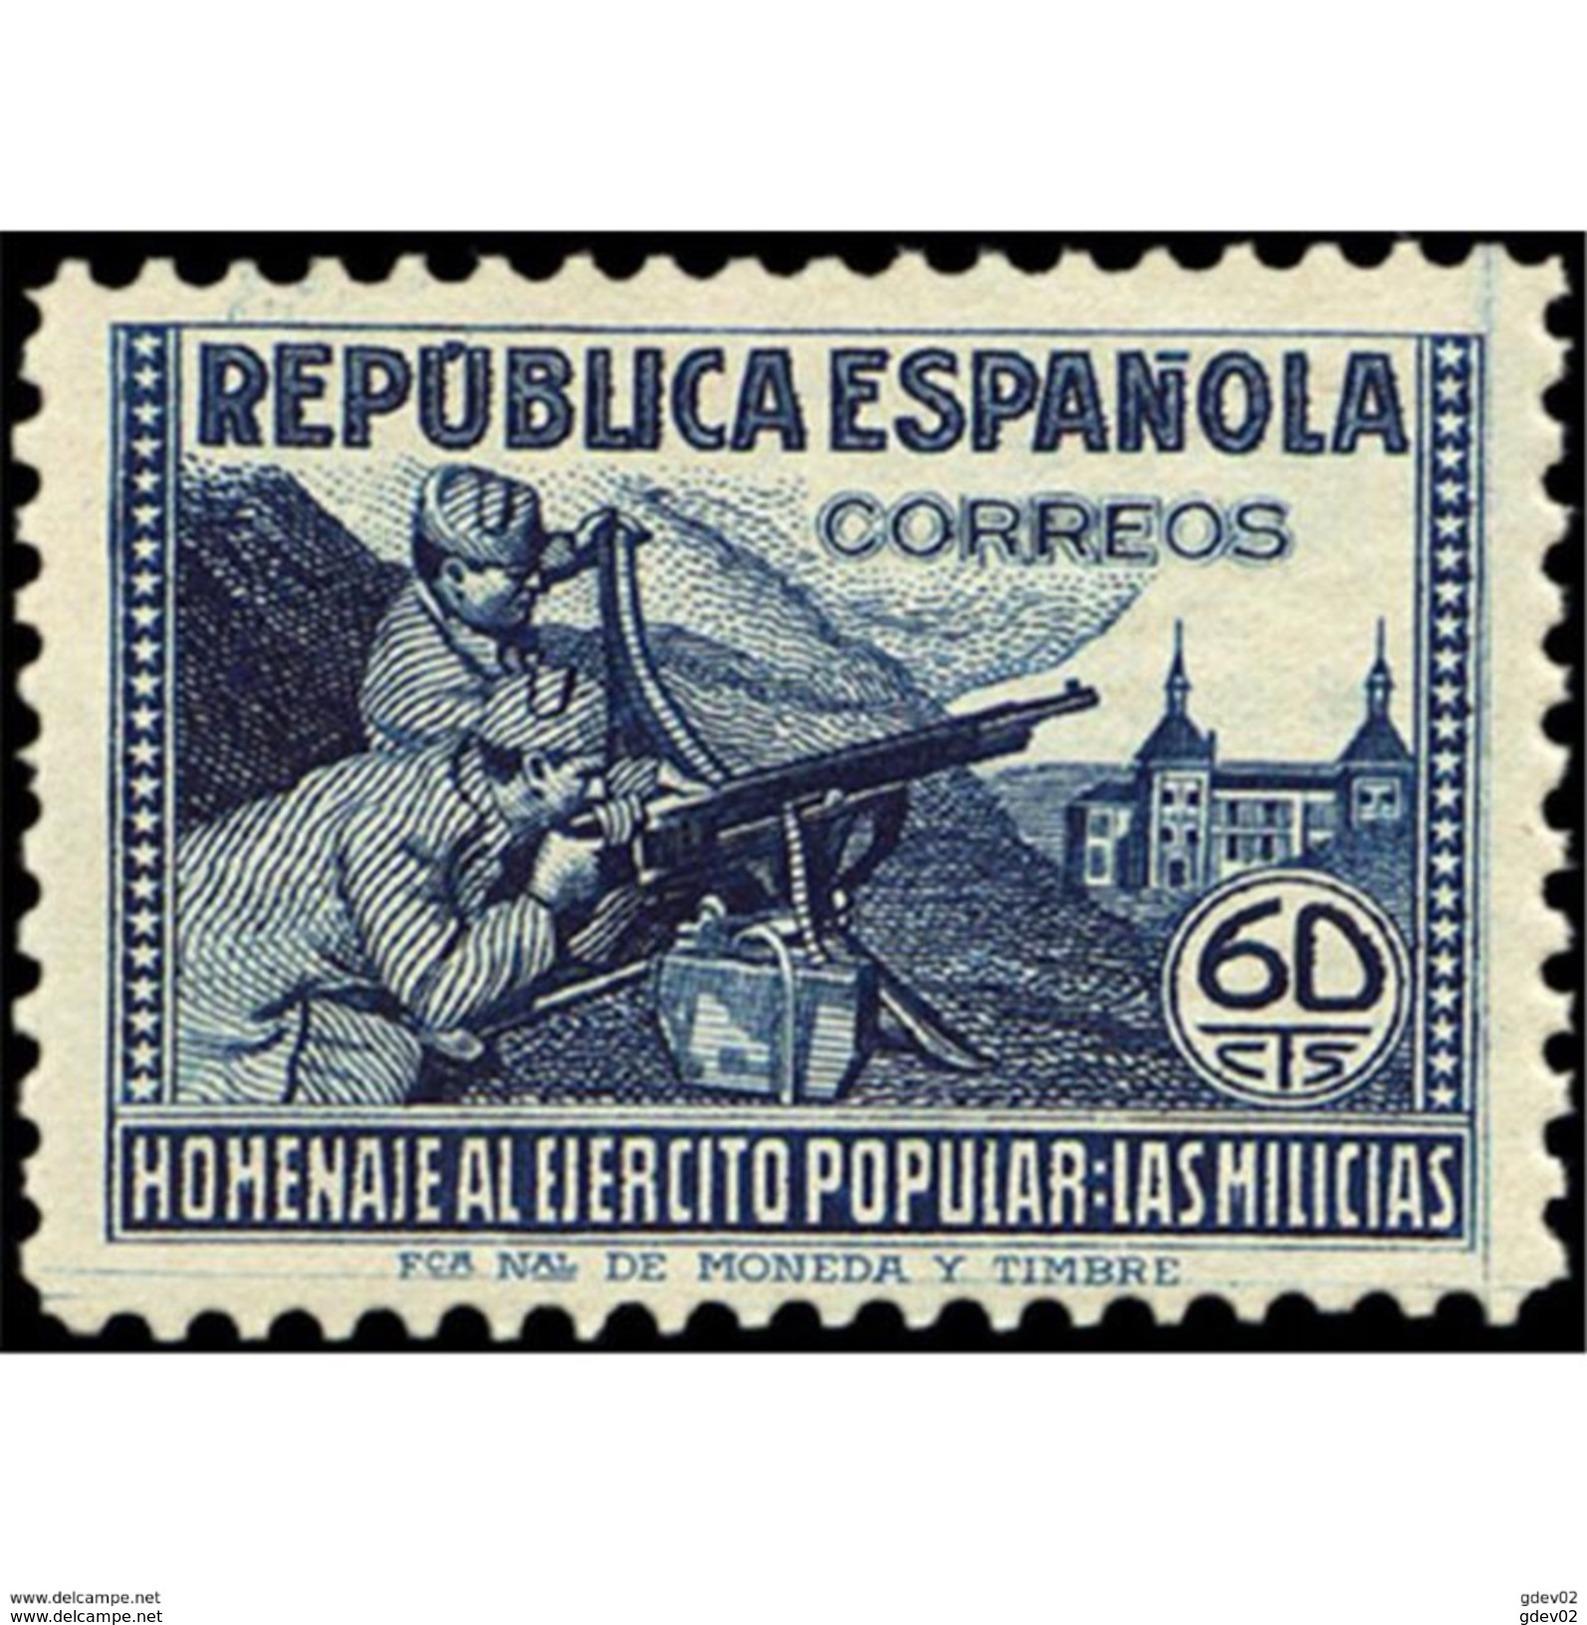 ES796STV-LTV***796STAN.Spain.Esgane .Militar.HOMENAJE AL EJERCITO POPULAR.1938(Ed 796**) - 1931-Hoy: 2ª República - ... Juan Carlos I